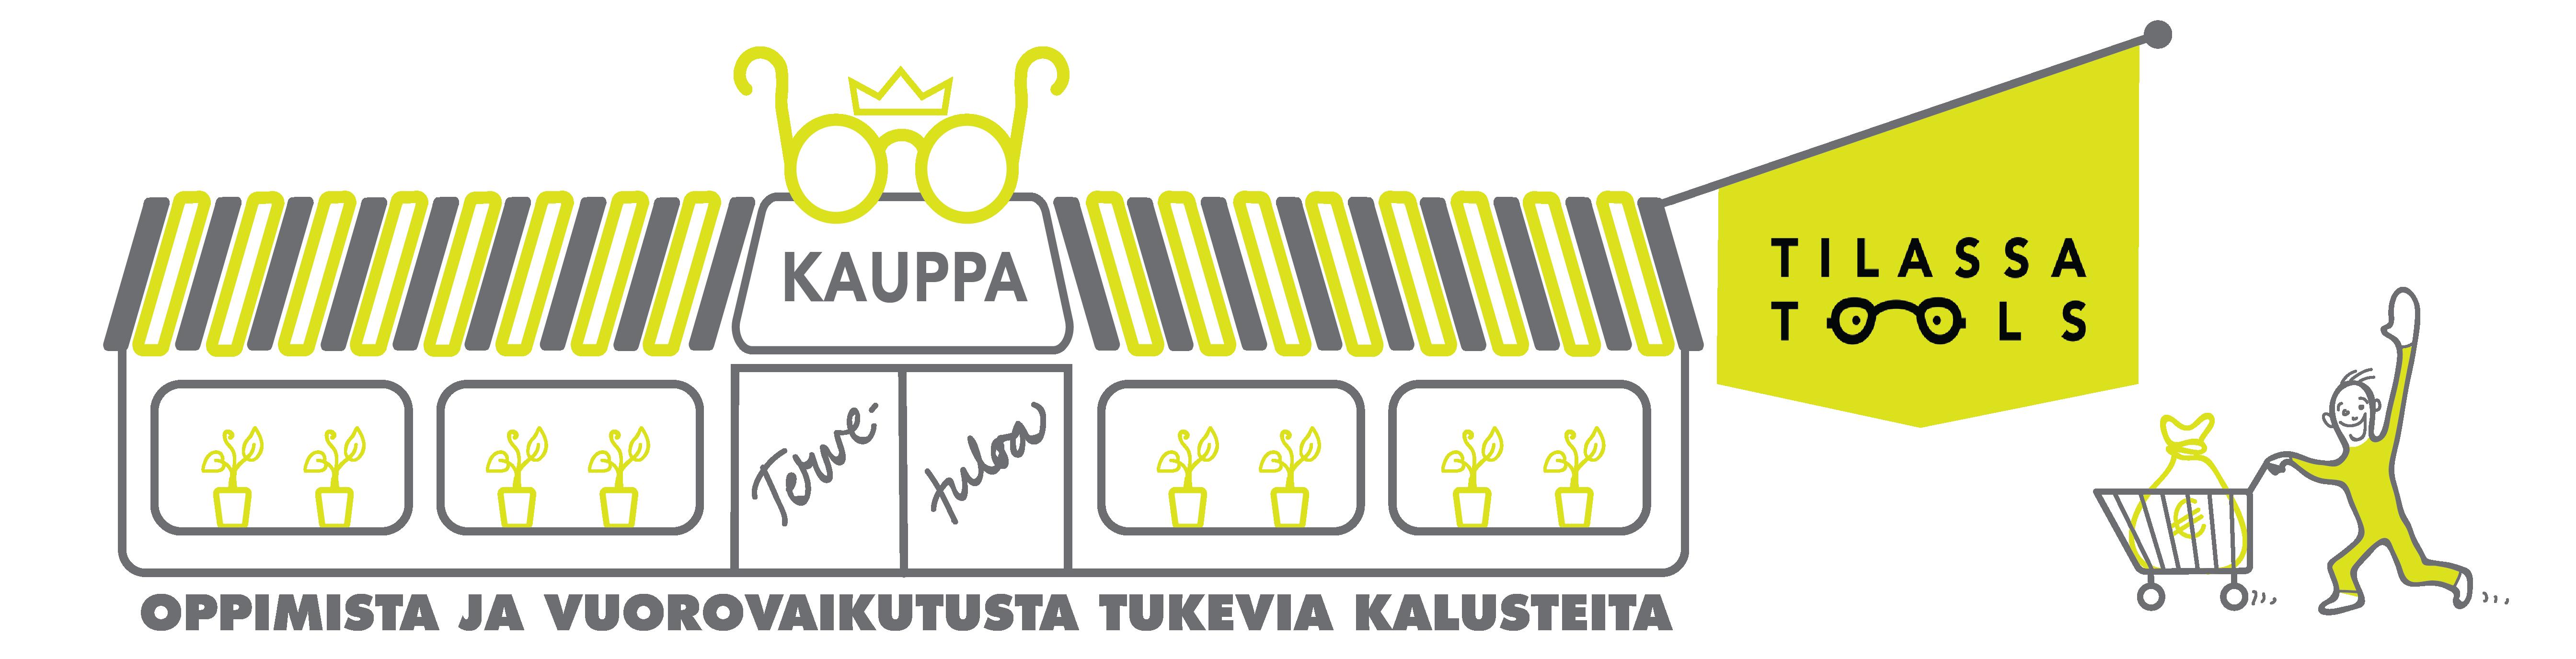 T-Tools kauppa-banneri-01